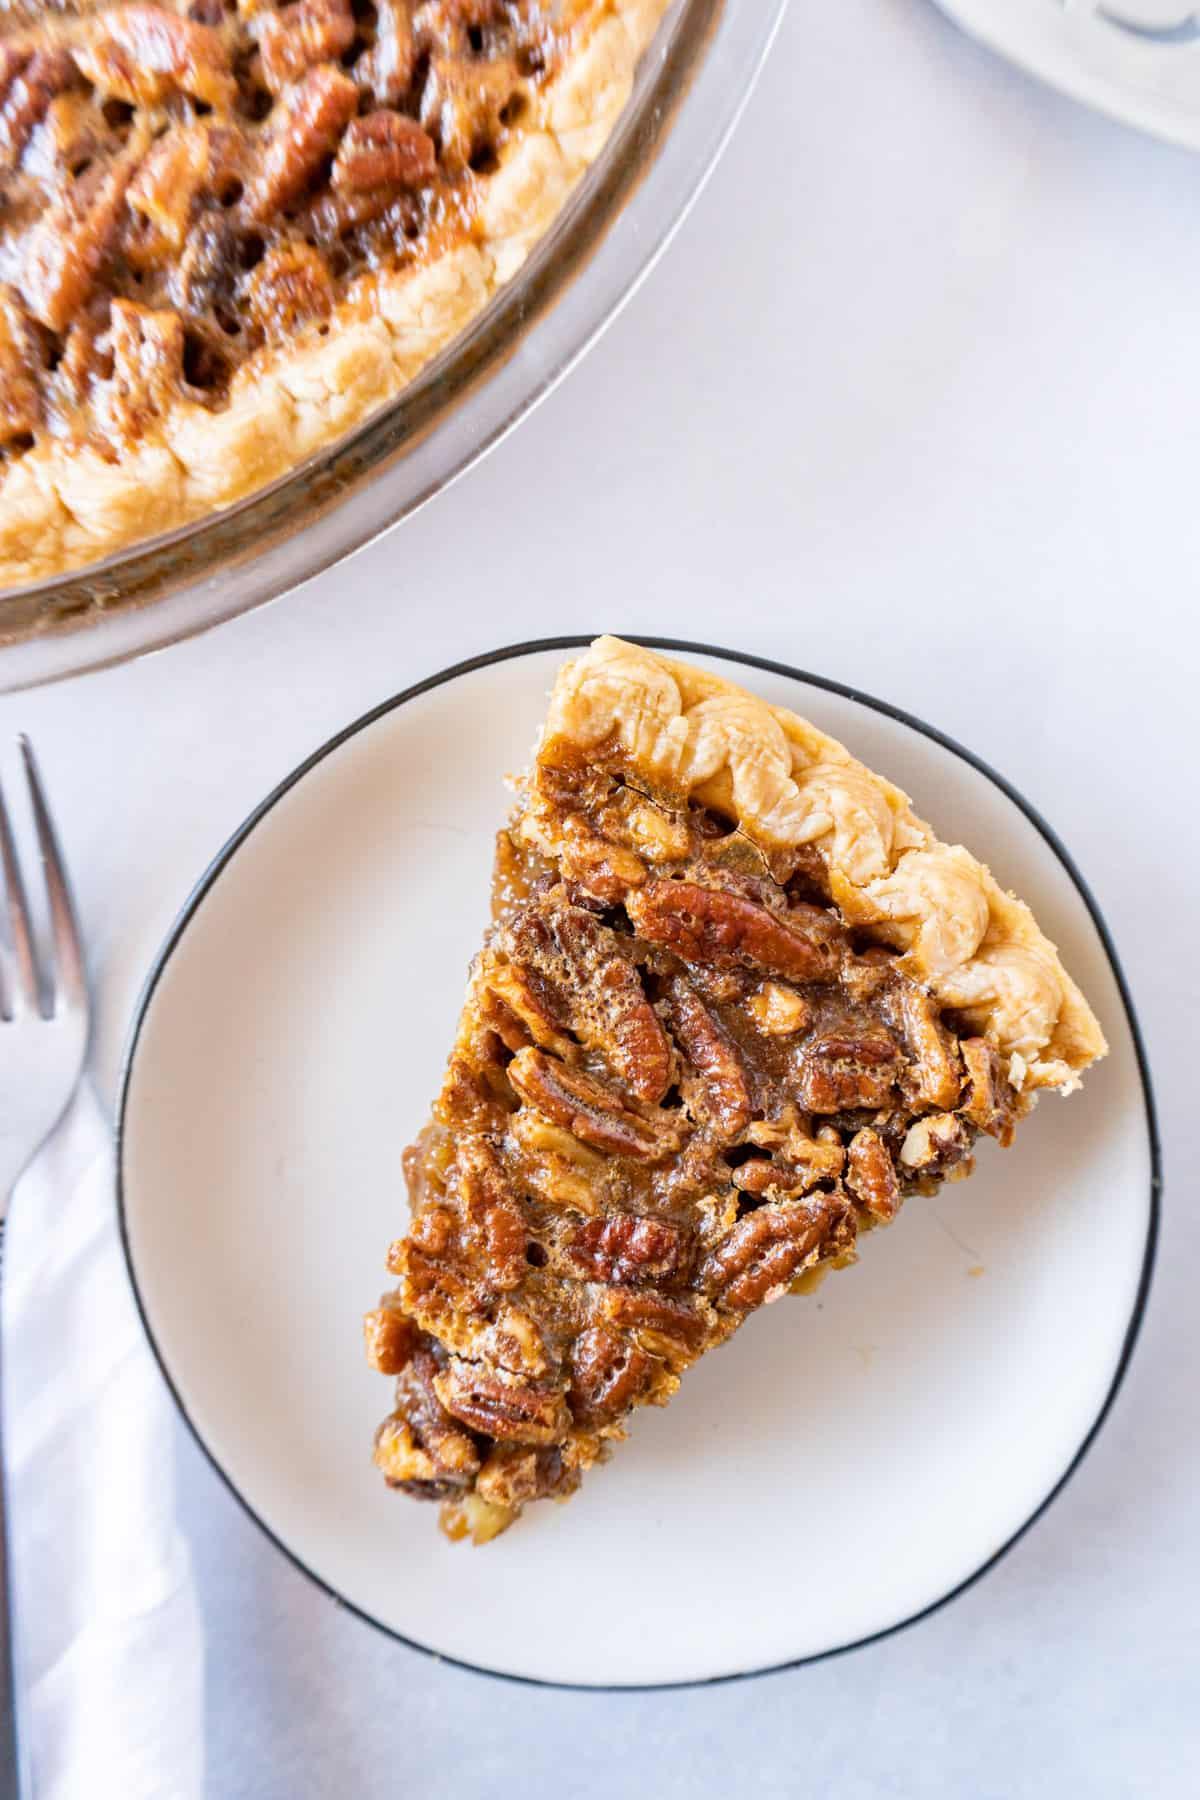 slicke of pecan pie on plate